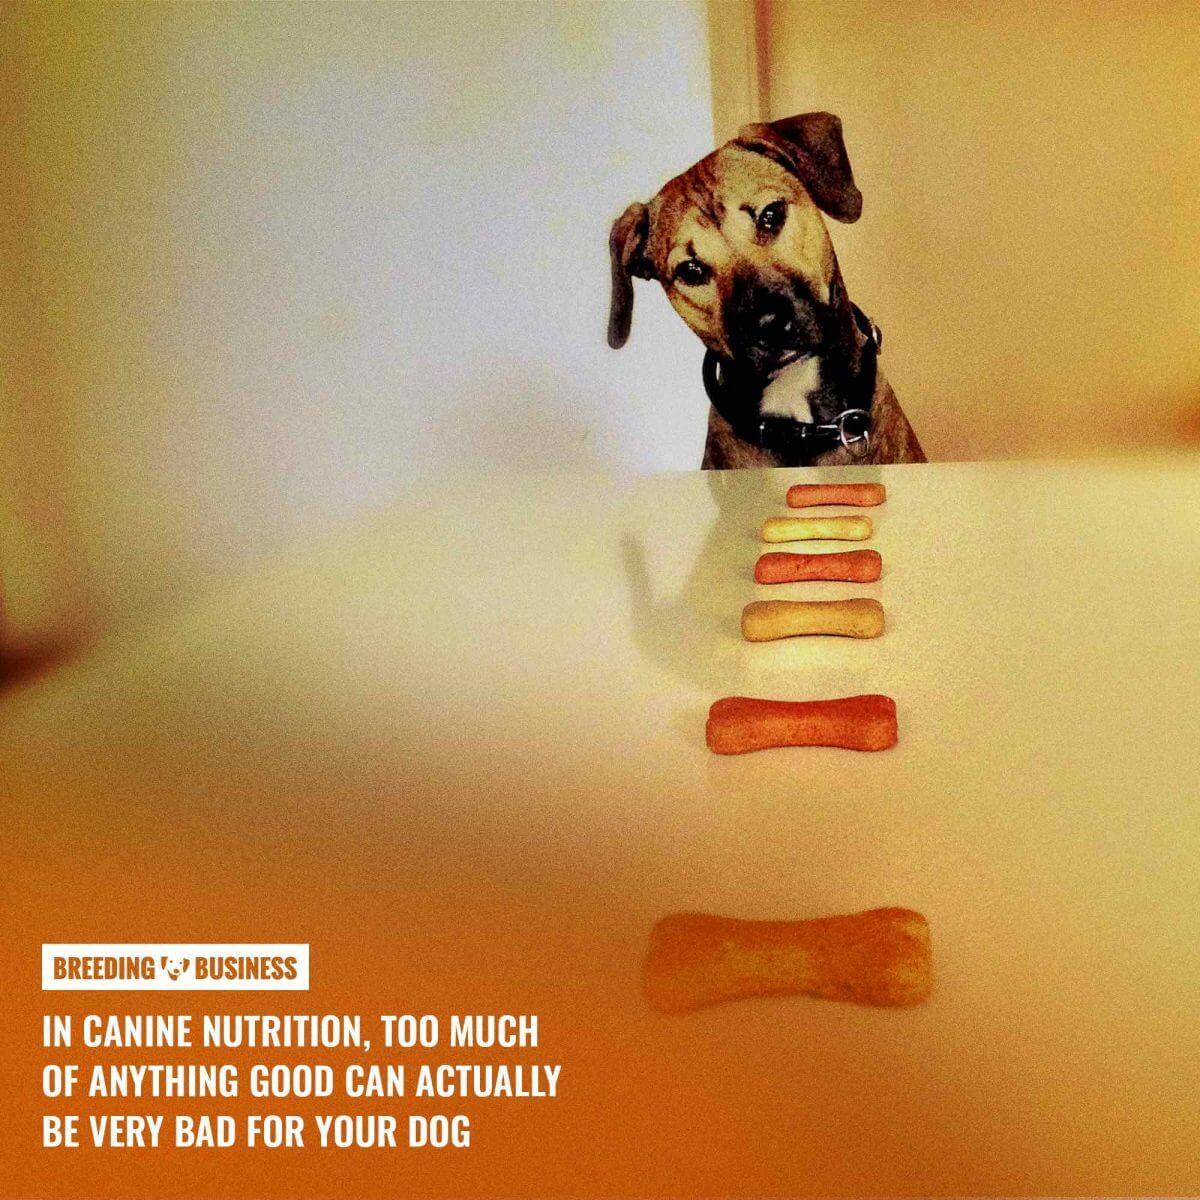 dog food enhancer calorie content